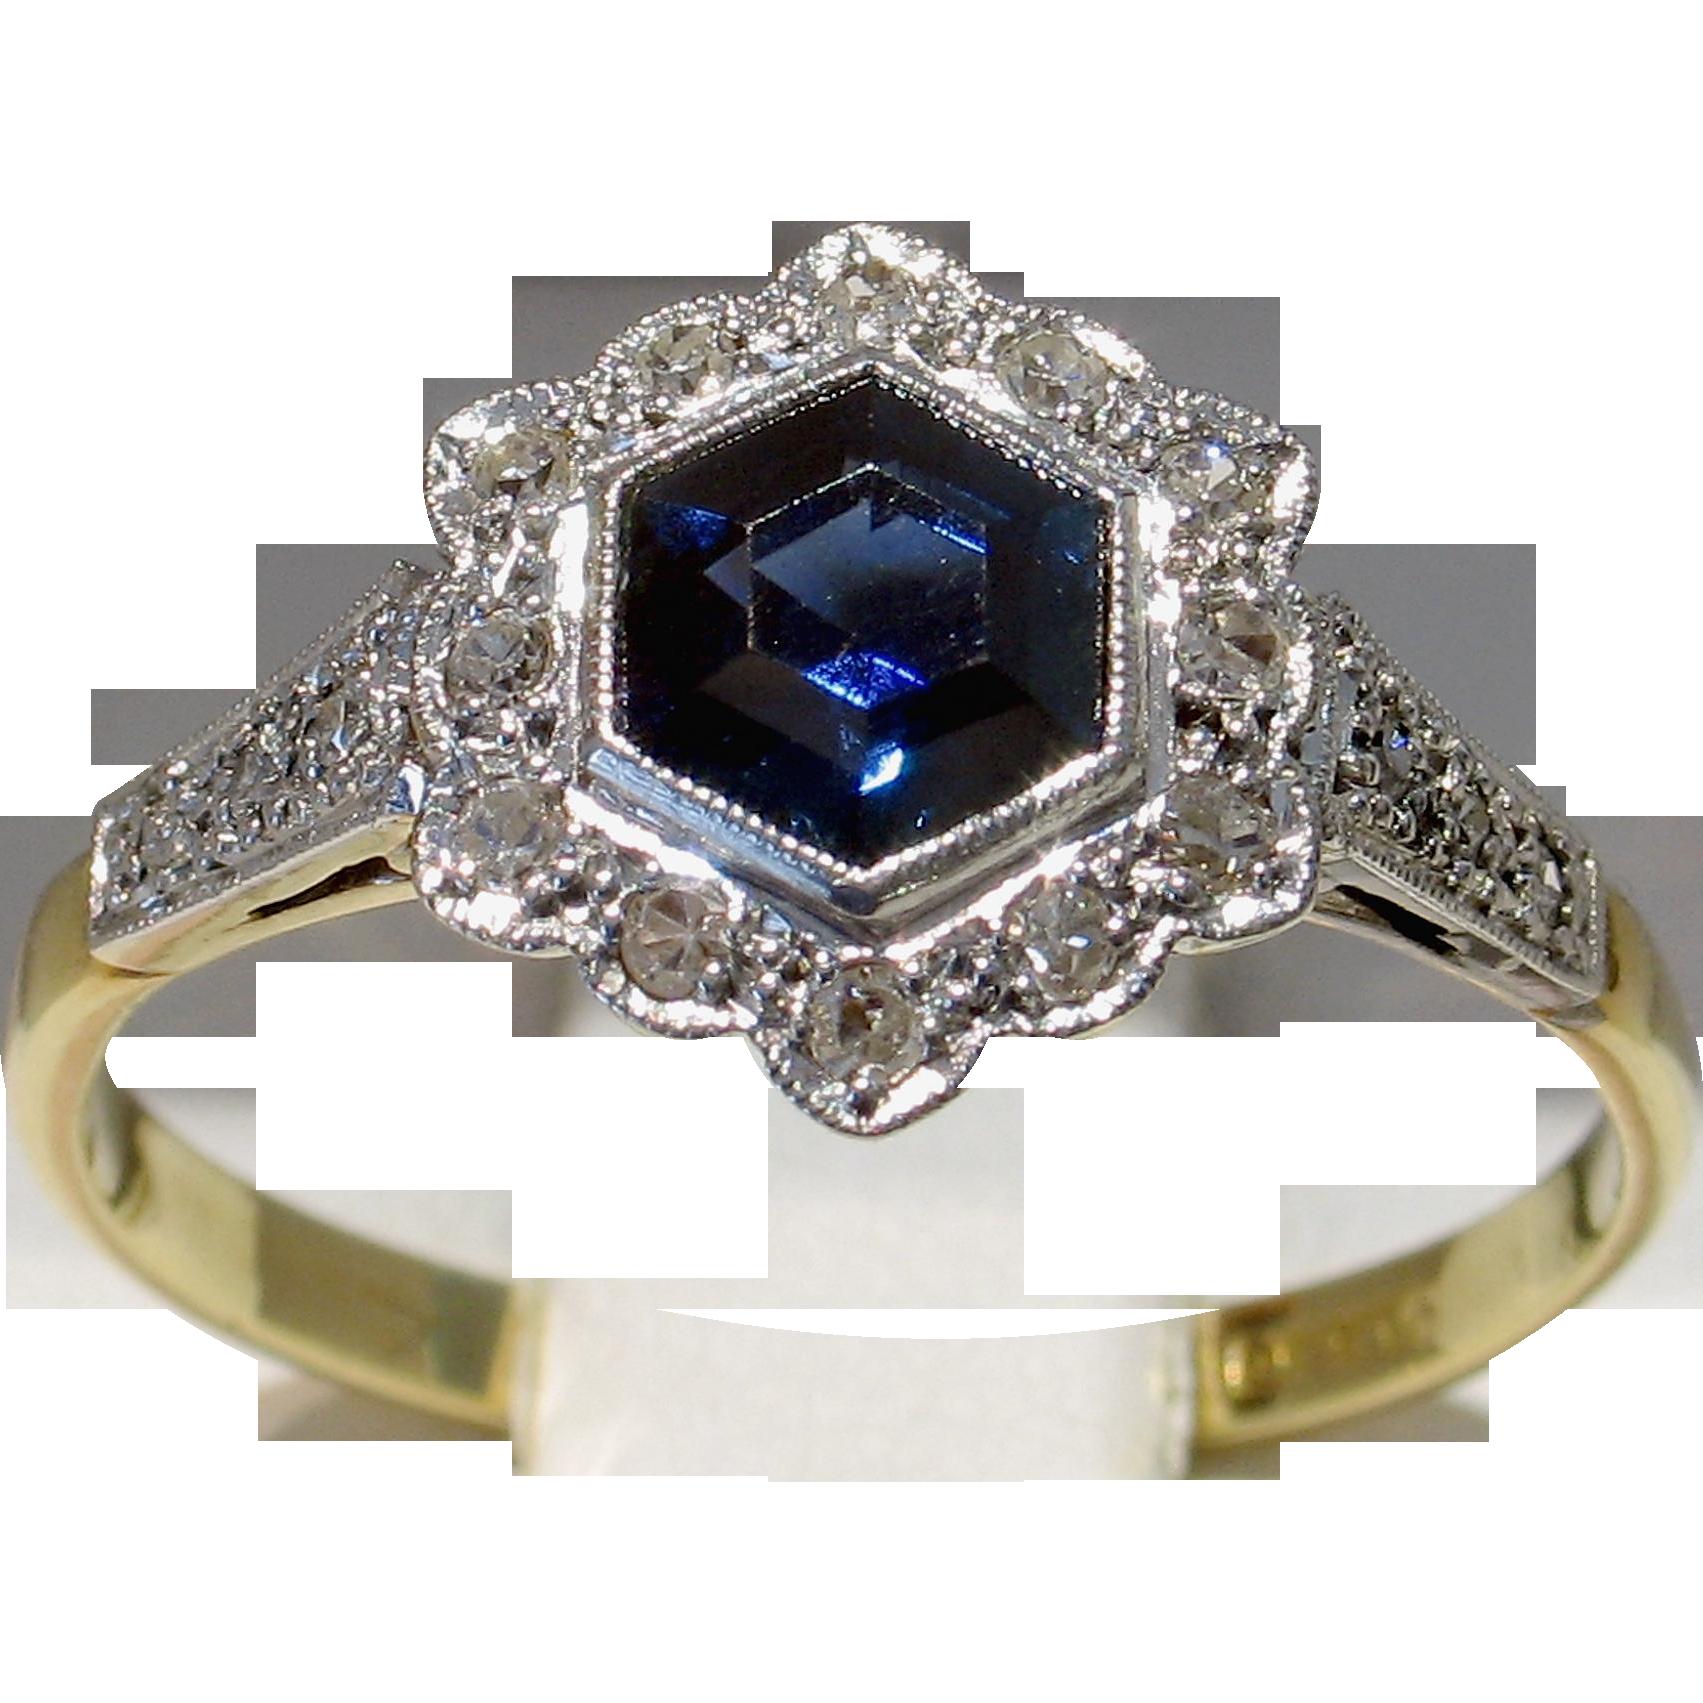 Darling 18kt Edwardian c 1910 Sapphire & Diamond Engagement Ring